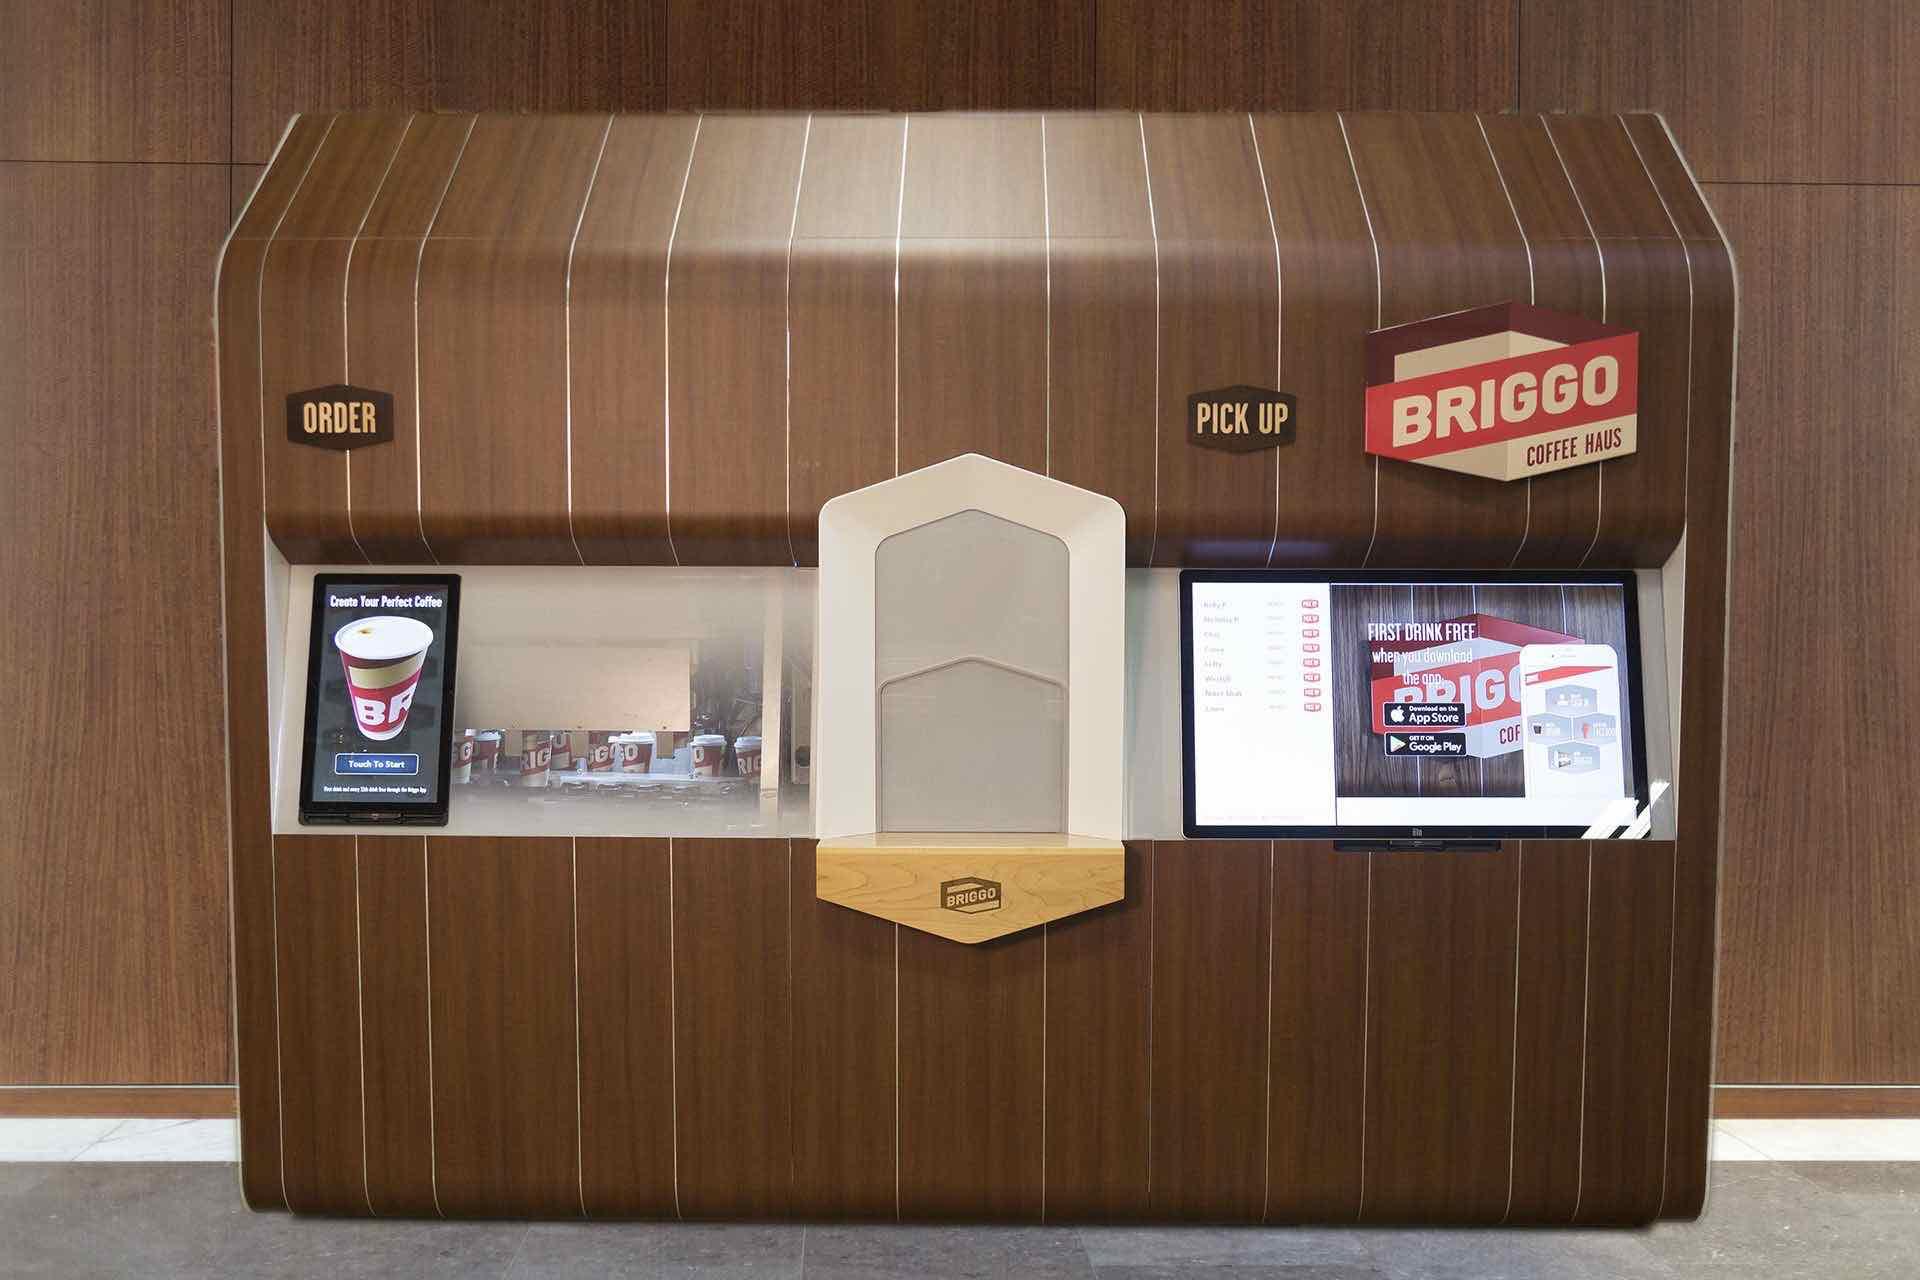 Briggo coffee austin